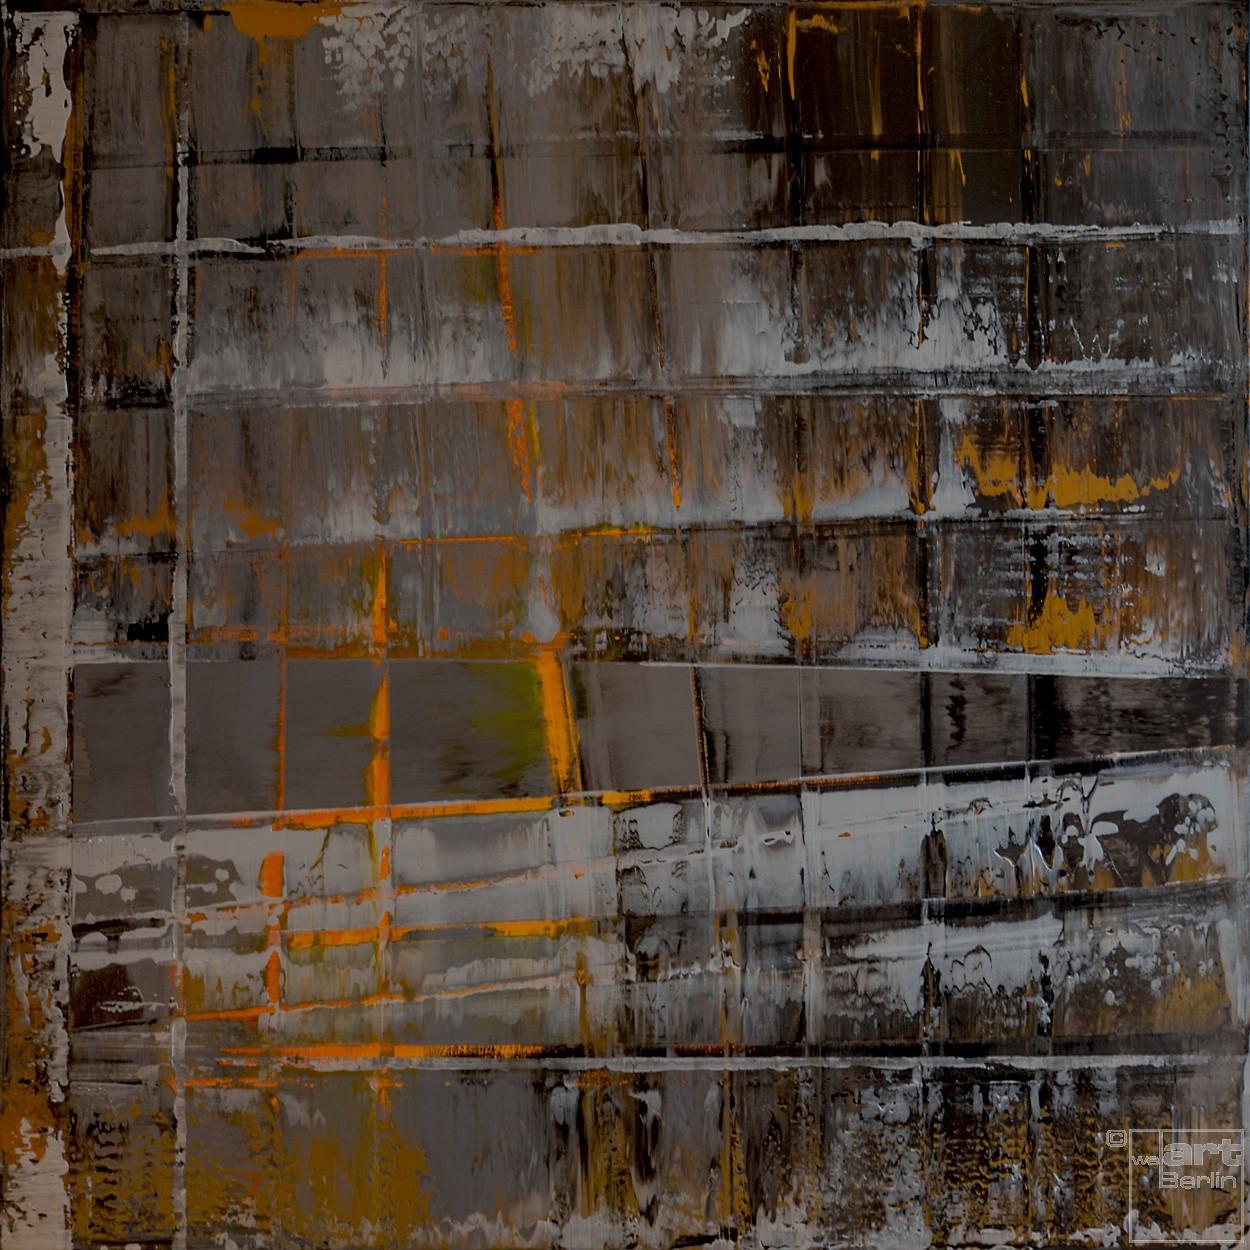 Onyx-Dekonstruktion | Malerei von Lali Torma | Acryl auf Leinwand, abstrakt